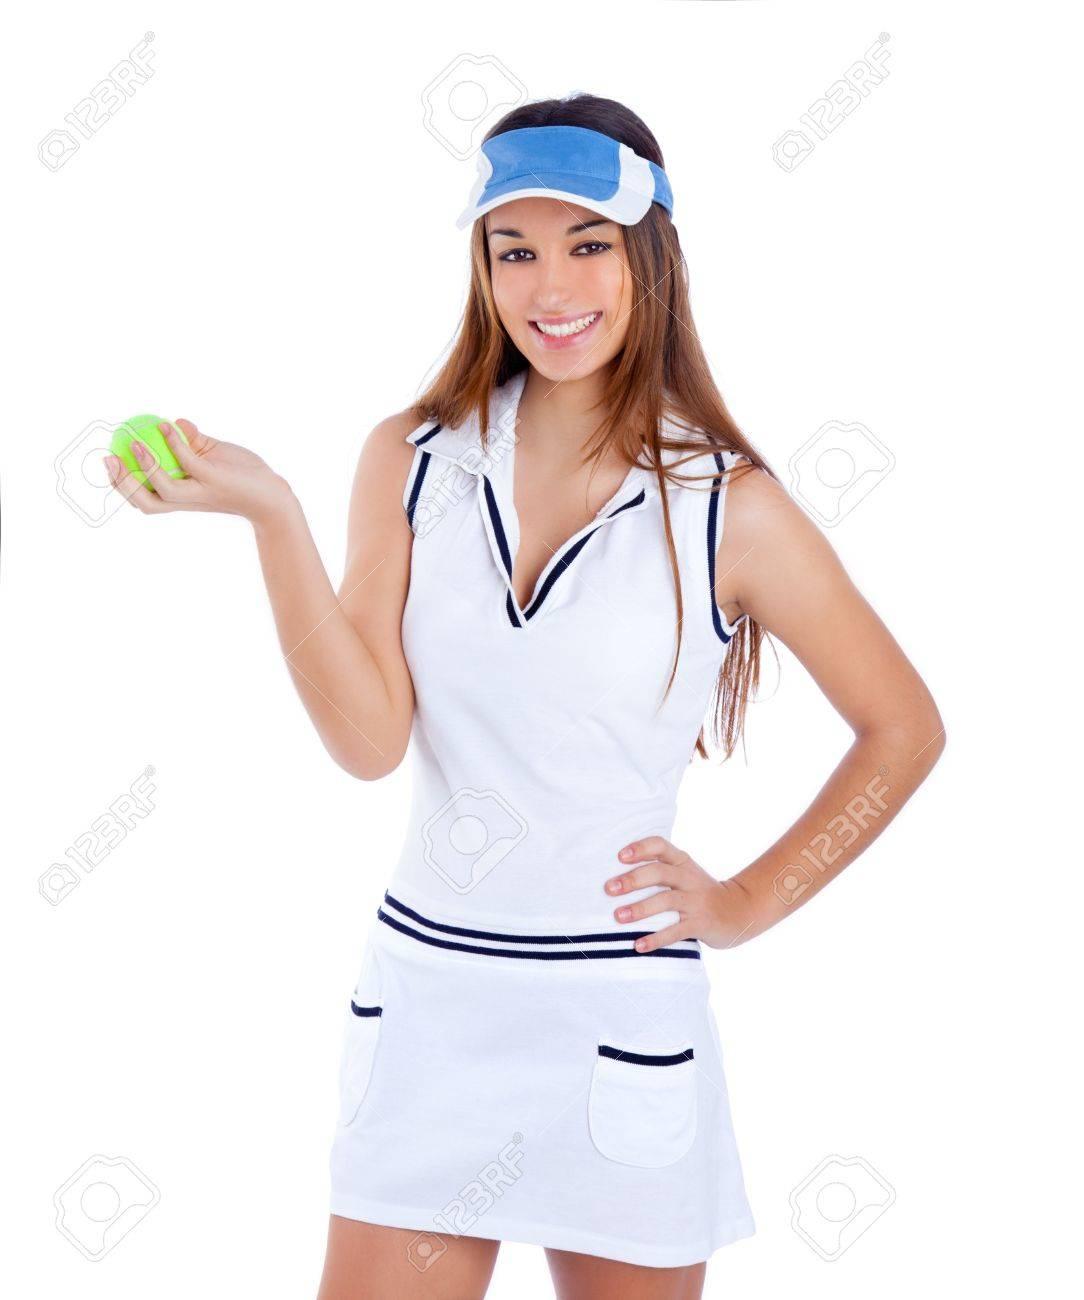 brunette tennis girl with white dress and sun visor cap with green ball  Stock Photo - 85b6199fd9b